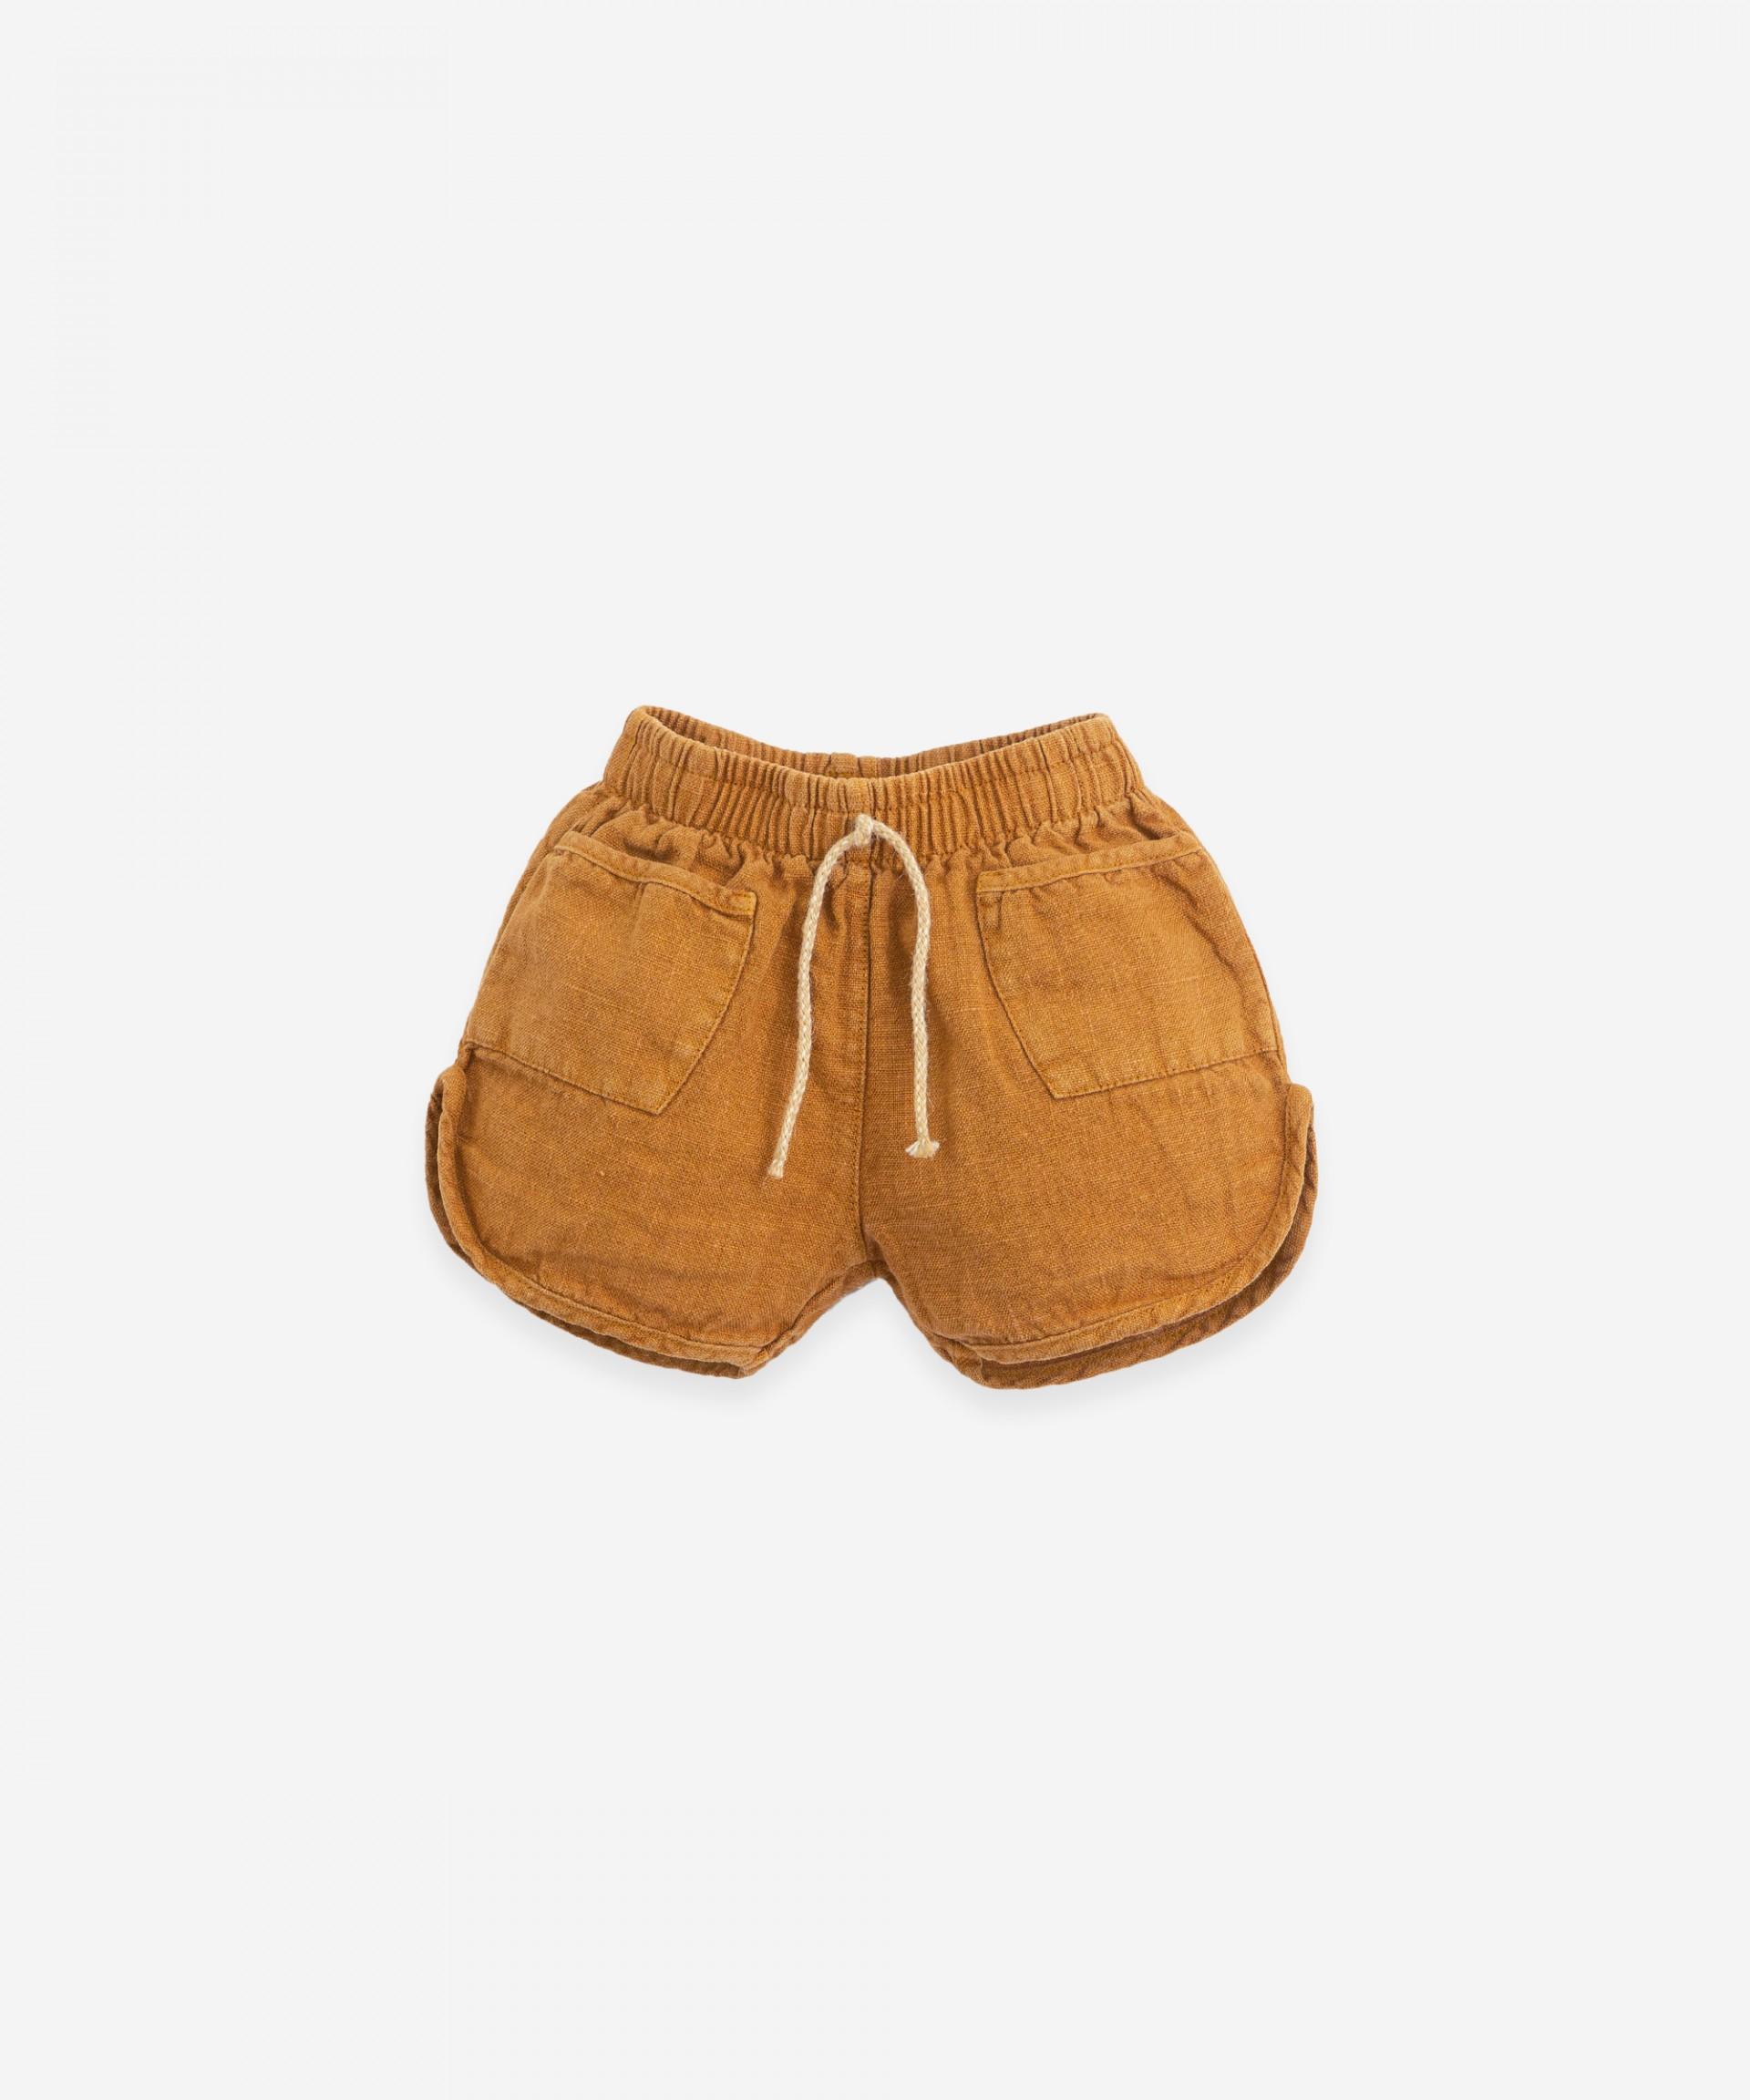 Shorts with jute cord | Botany